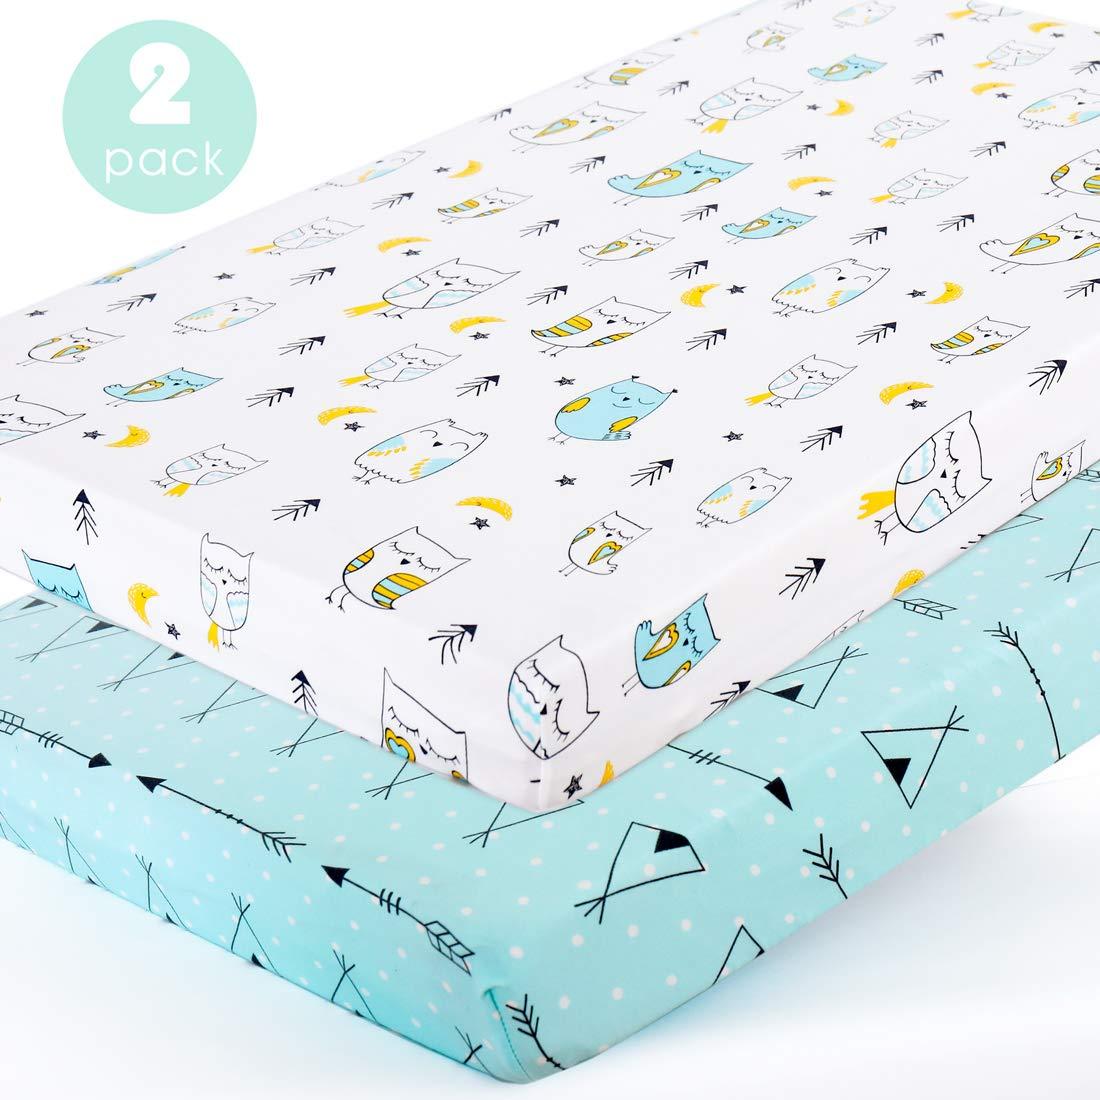 Stretchy-Pack-n-Play-Playard-Sheets-Brolex 2 Pack Portable Mini Crib Sheets,Convertible Playard Mattress Cover for Baby Boys Gilrs,Ultra Soft Jersey Knit,Arrow /& Owl